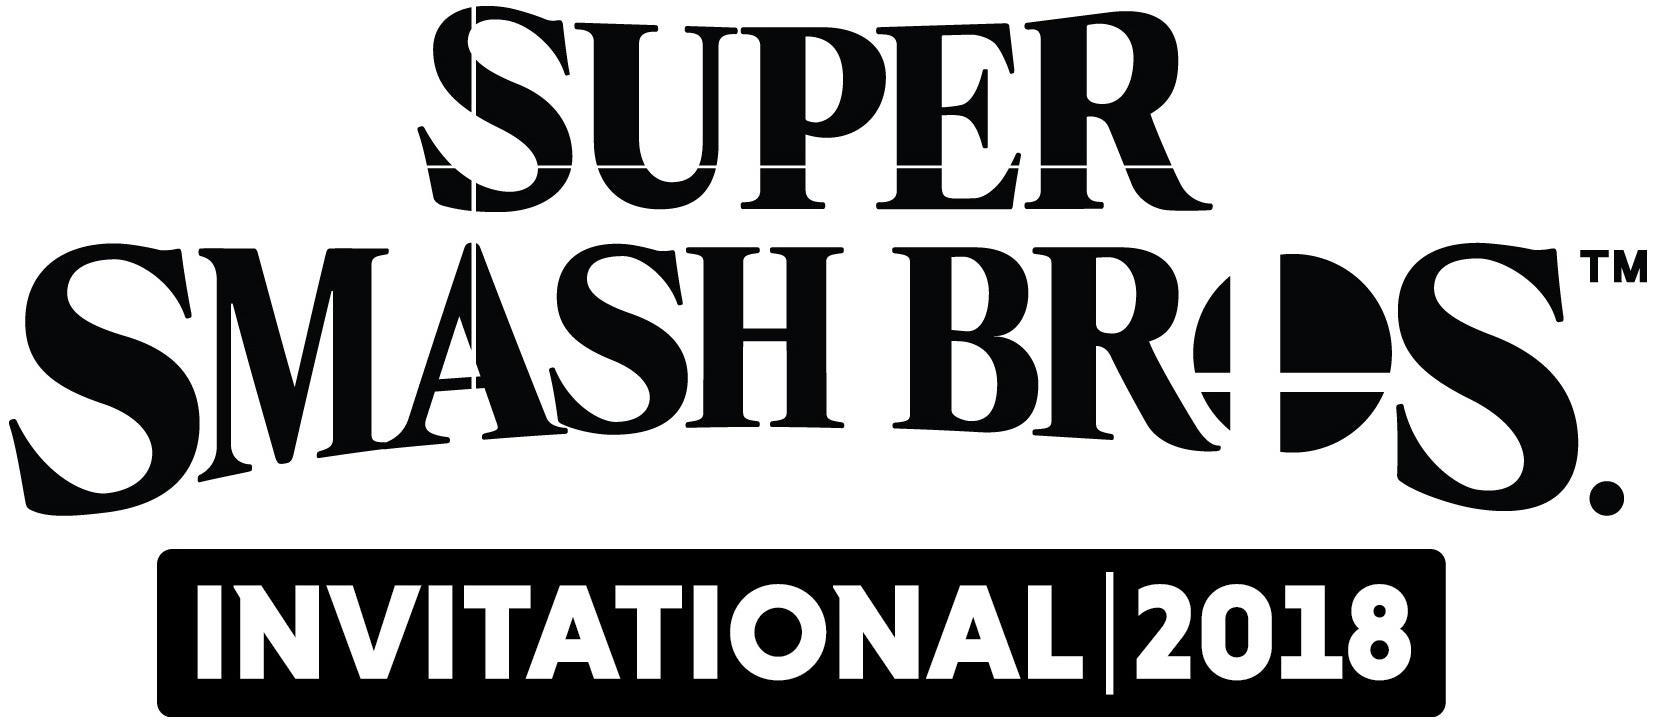 Logo Smash Bros. Invitational 2018